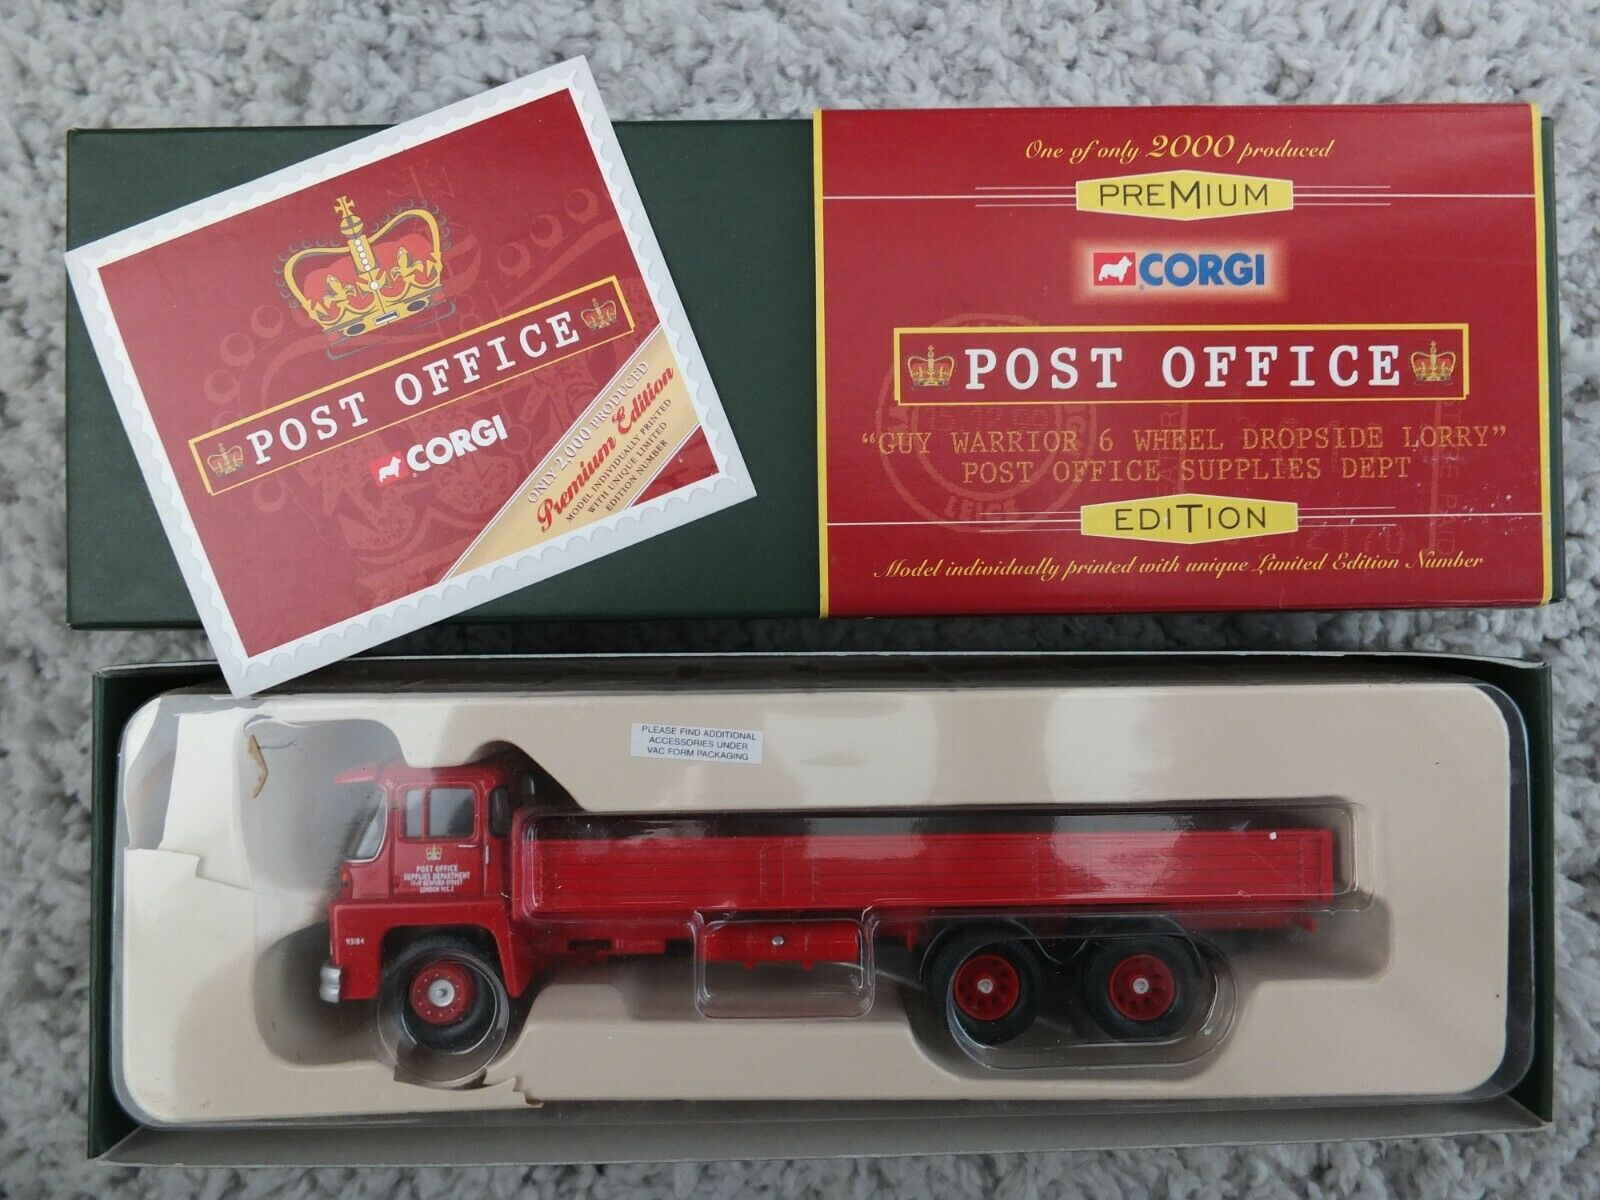 Corgi Premium Edition 29501 Post Office Guy Warrior 6 wheel Dropside Lorry